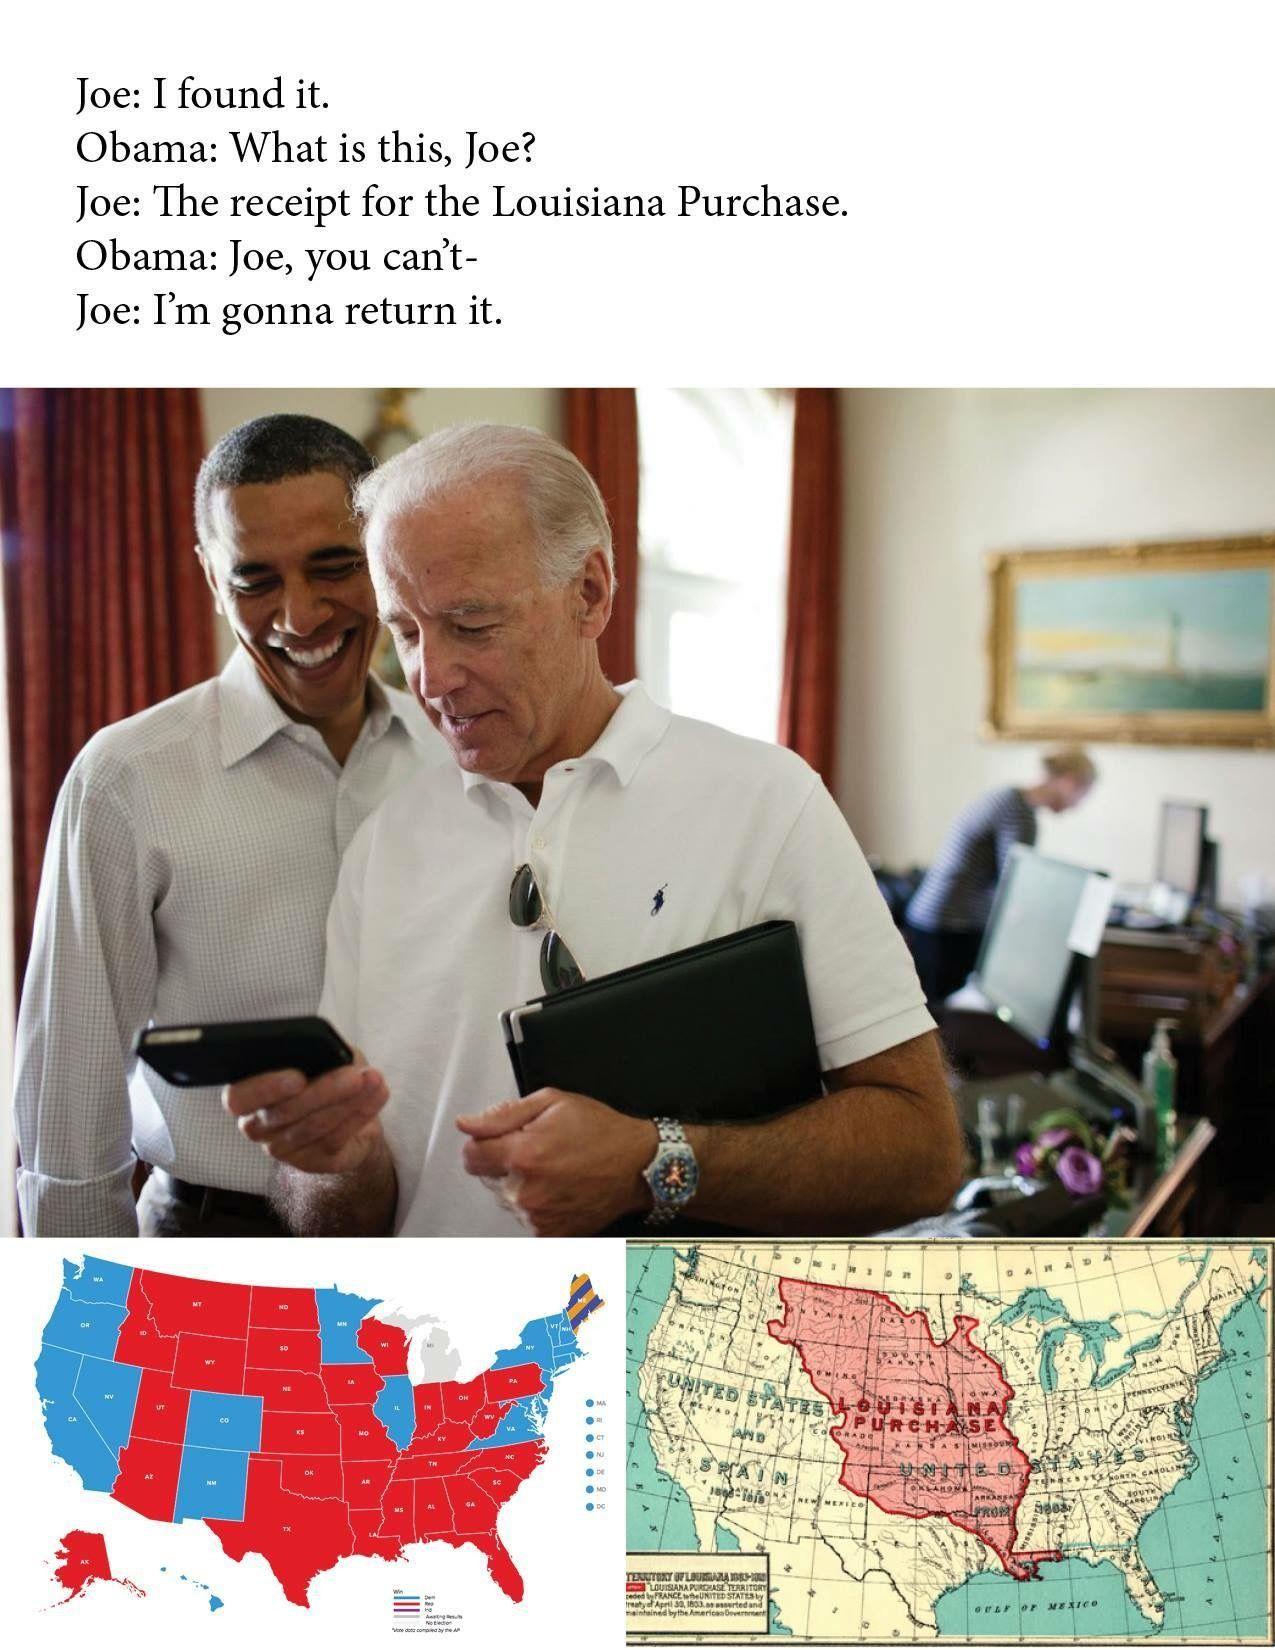 Pin on President Barack Obama & Michelle Obama